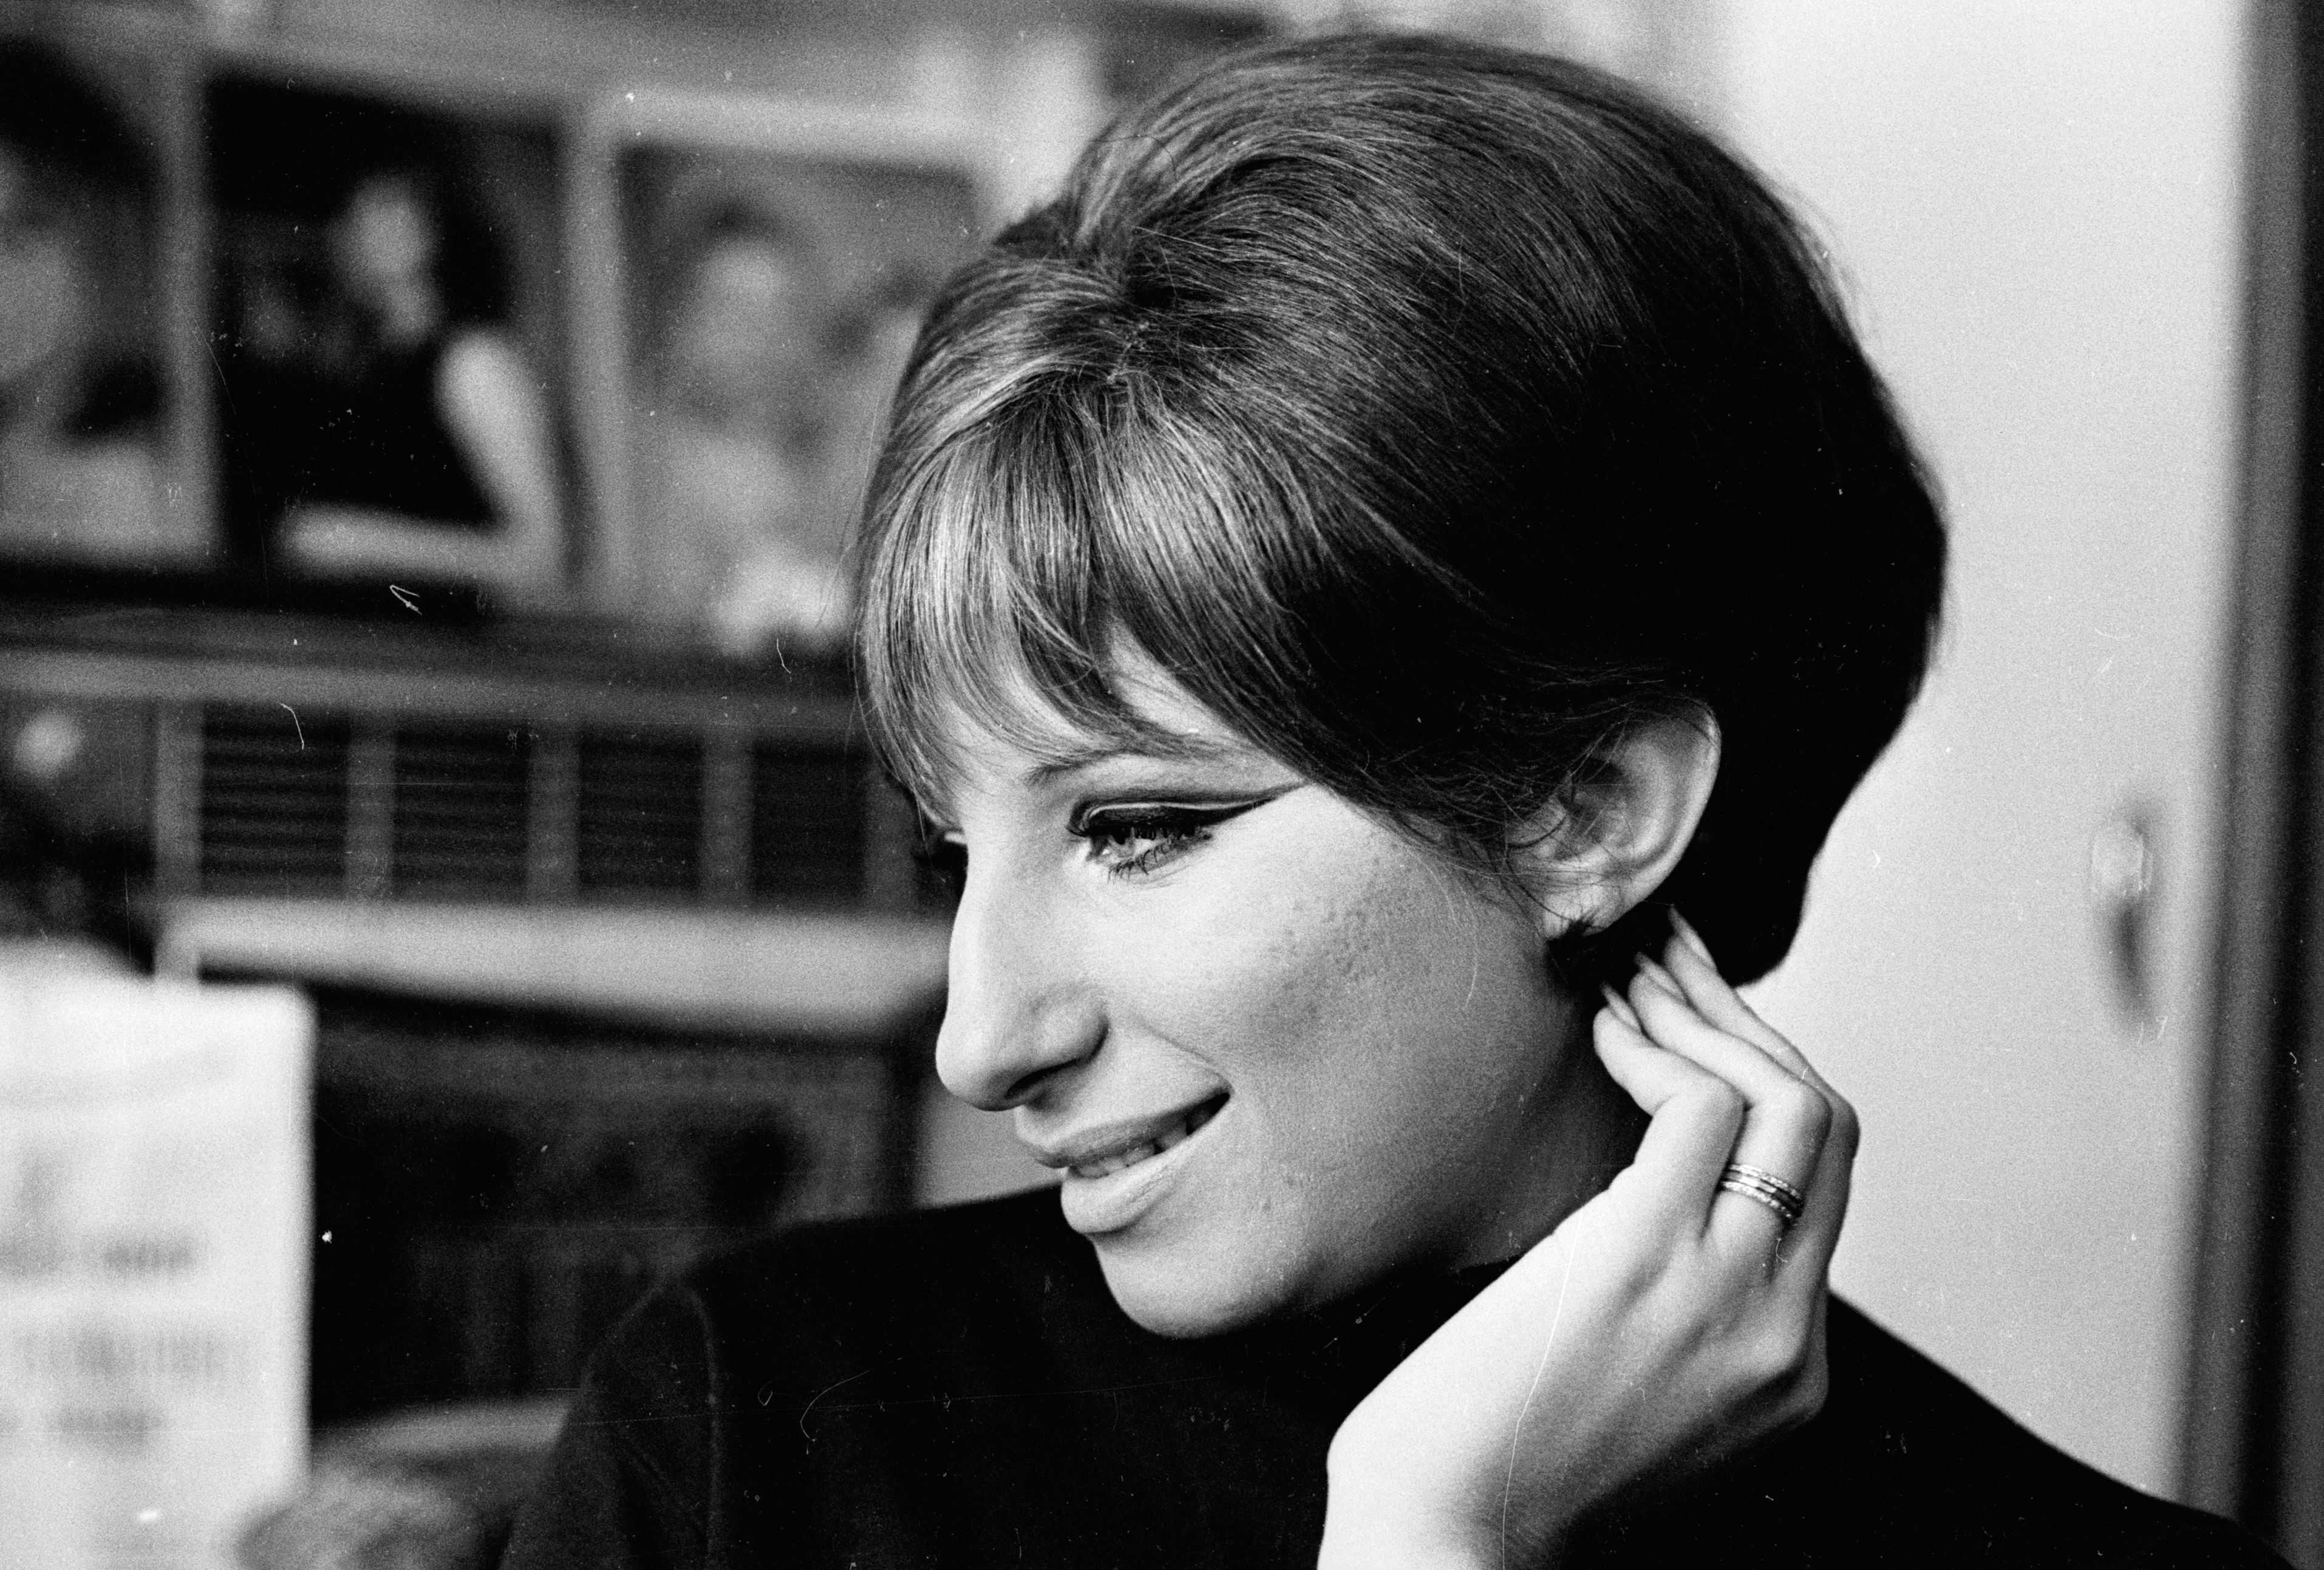 barbra streisand birthday WATCH: 19 Reasons Why Barbra Streisand's Birthday Should be a  barbra streisand birthday